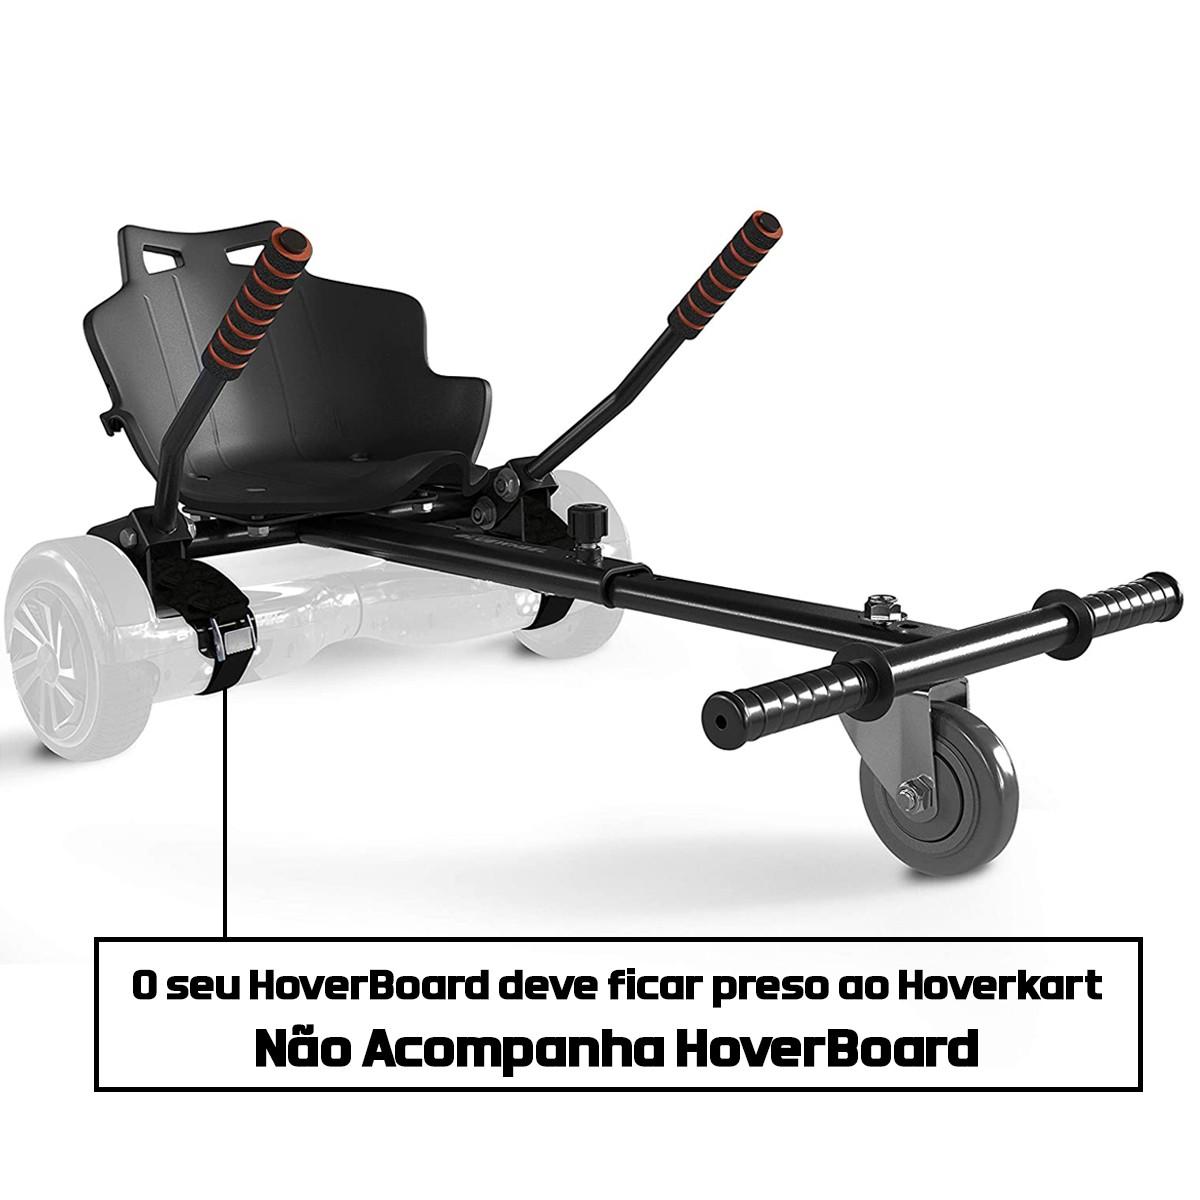 Suporte Hoverkart para Hoverboard Universal até 100 Kg Poliparts